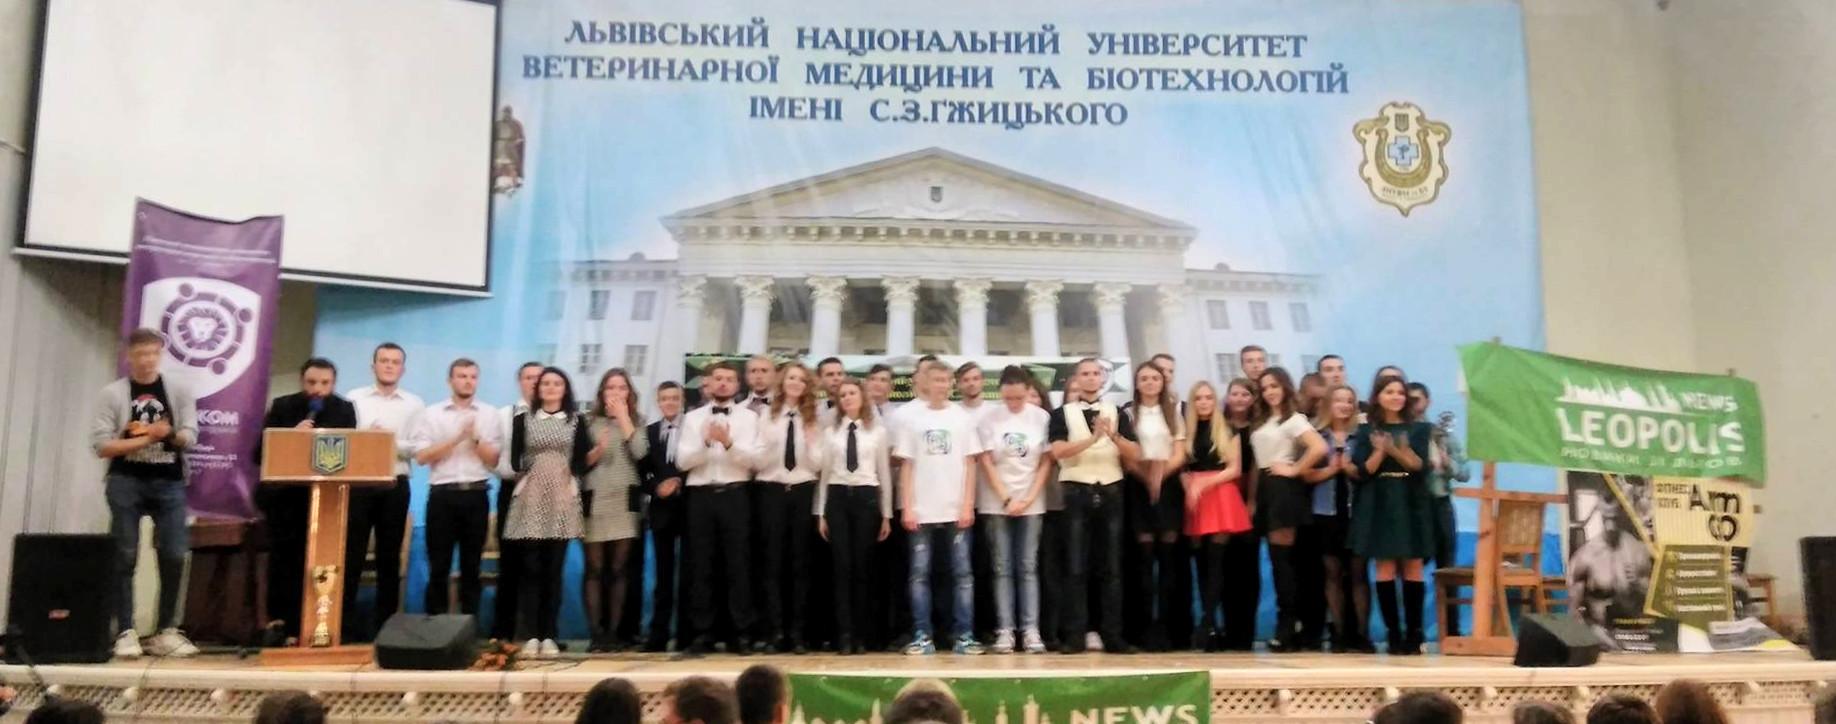 Результат 10-го кубку КВН ЛНУВМтаБТ ім. С. З. Гжицького